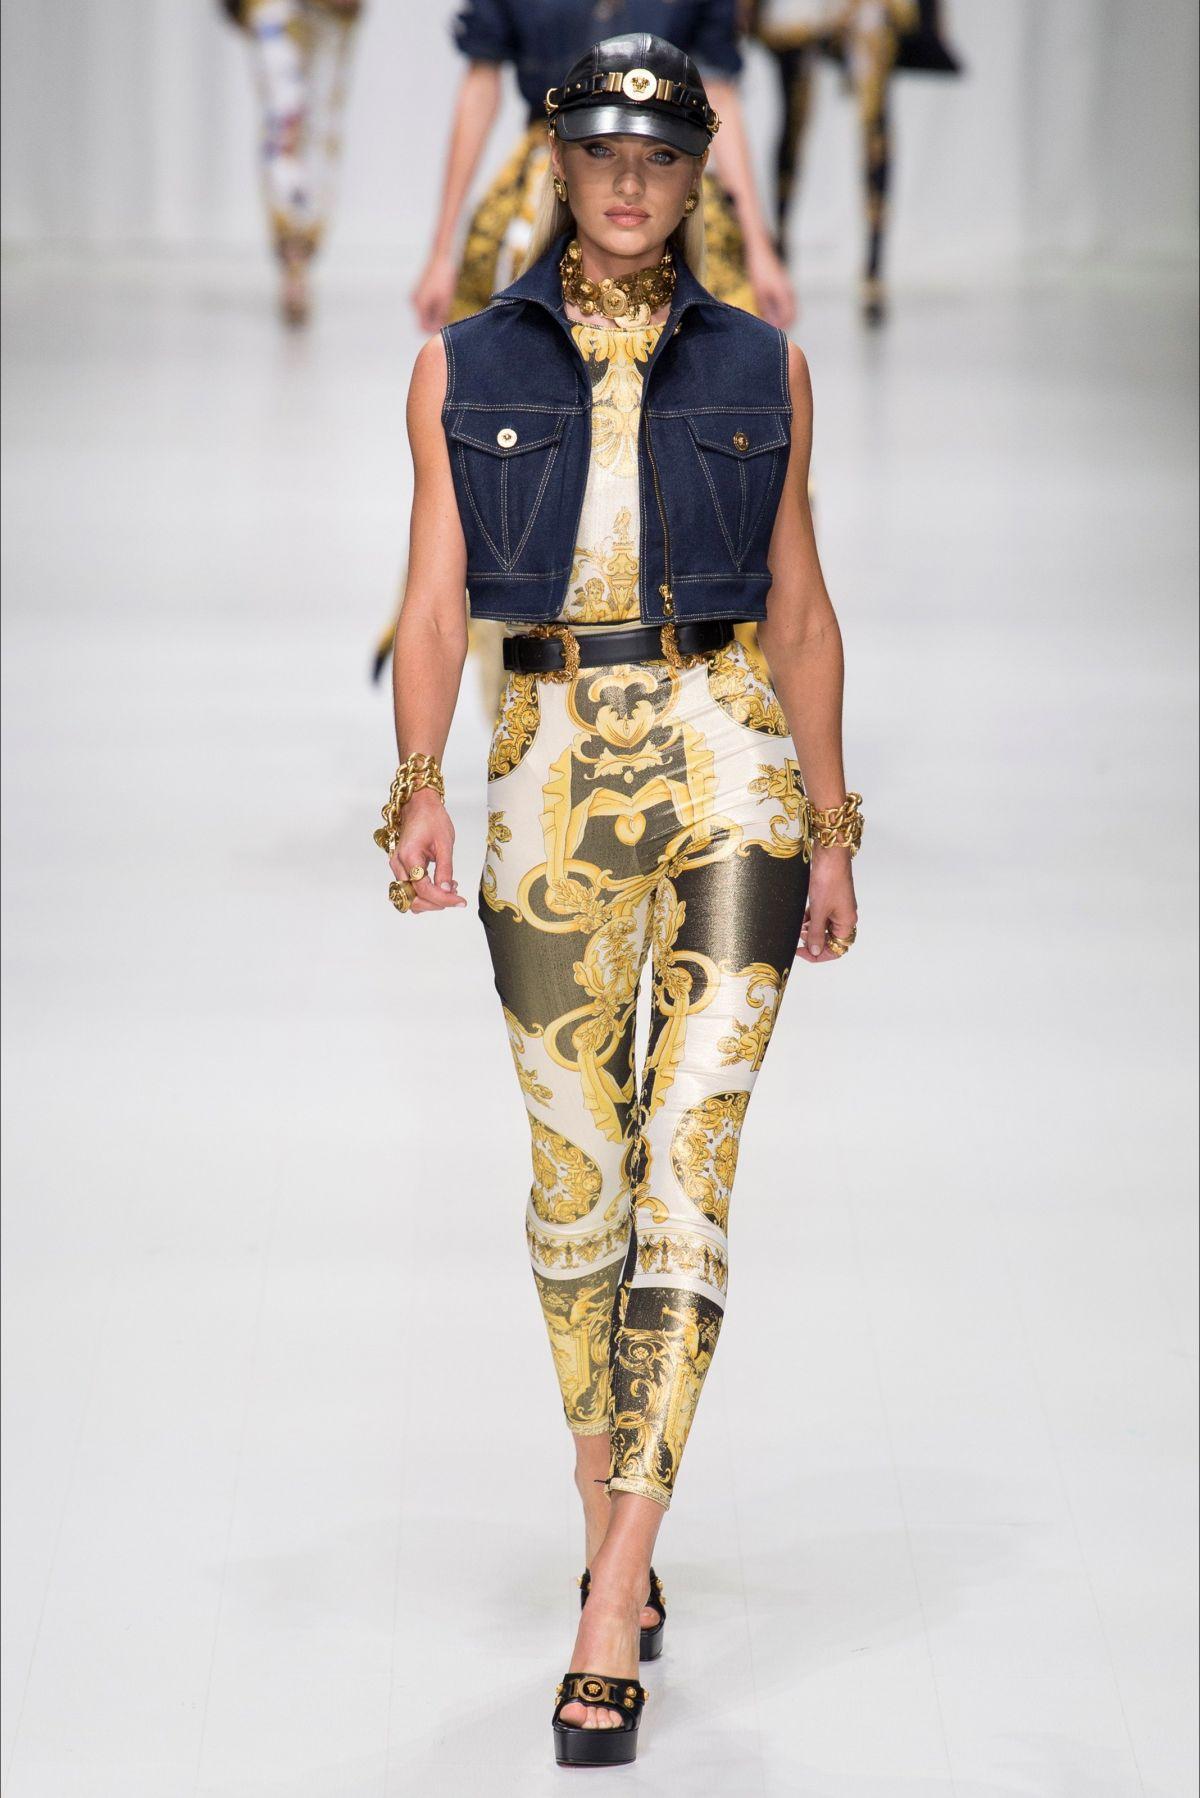 CANDICE SWANEPOEL at Versace Fashion Show at Milan 09/22/2017